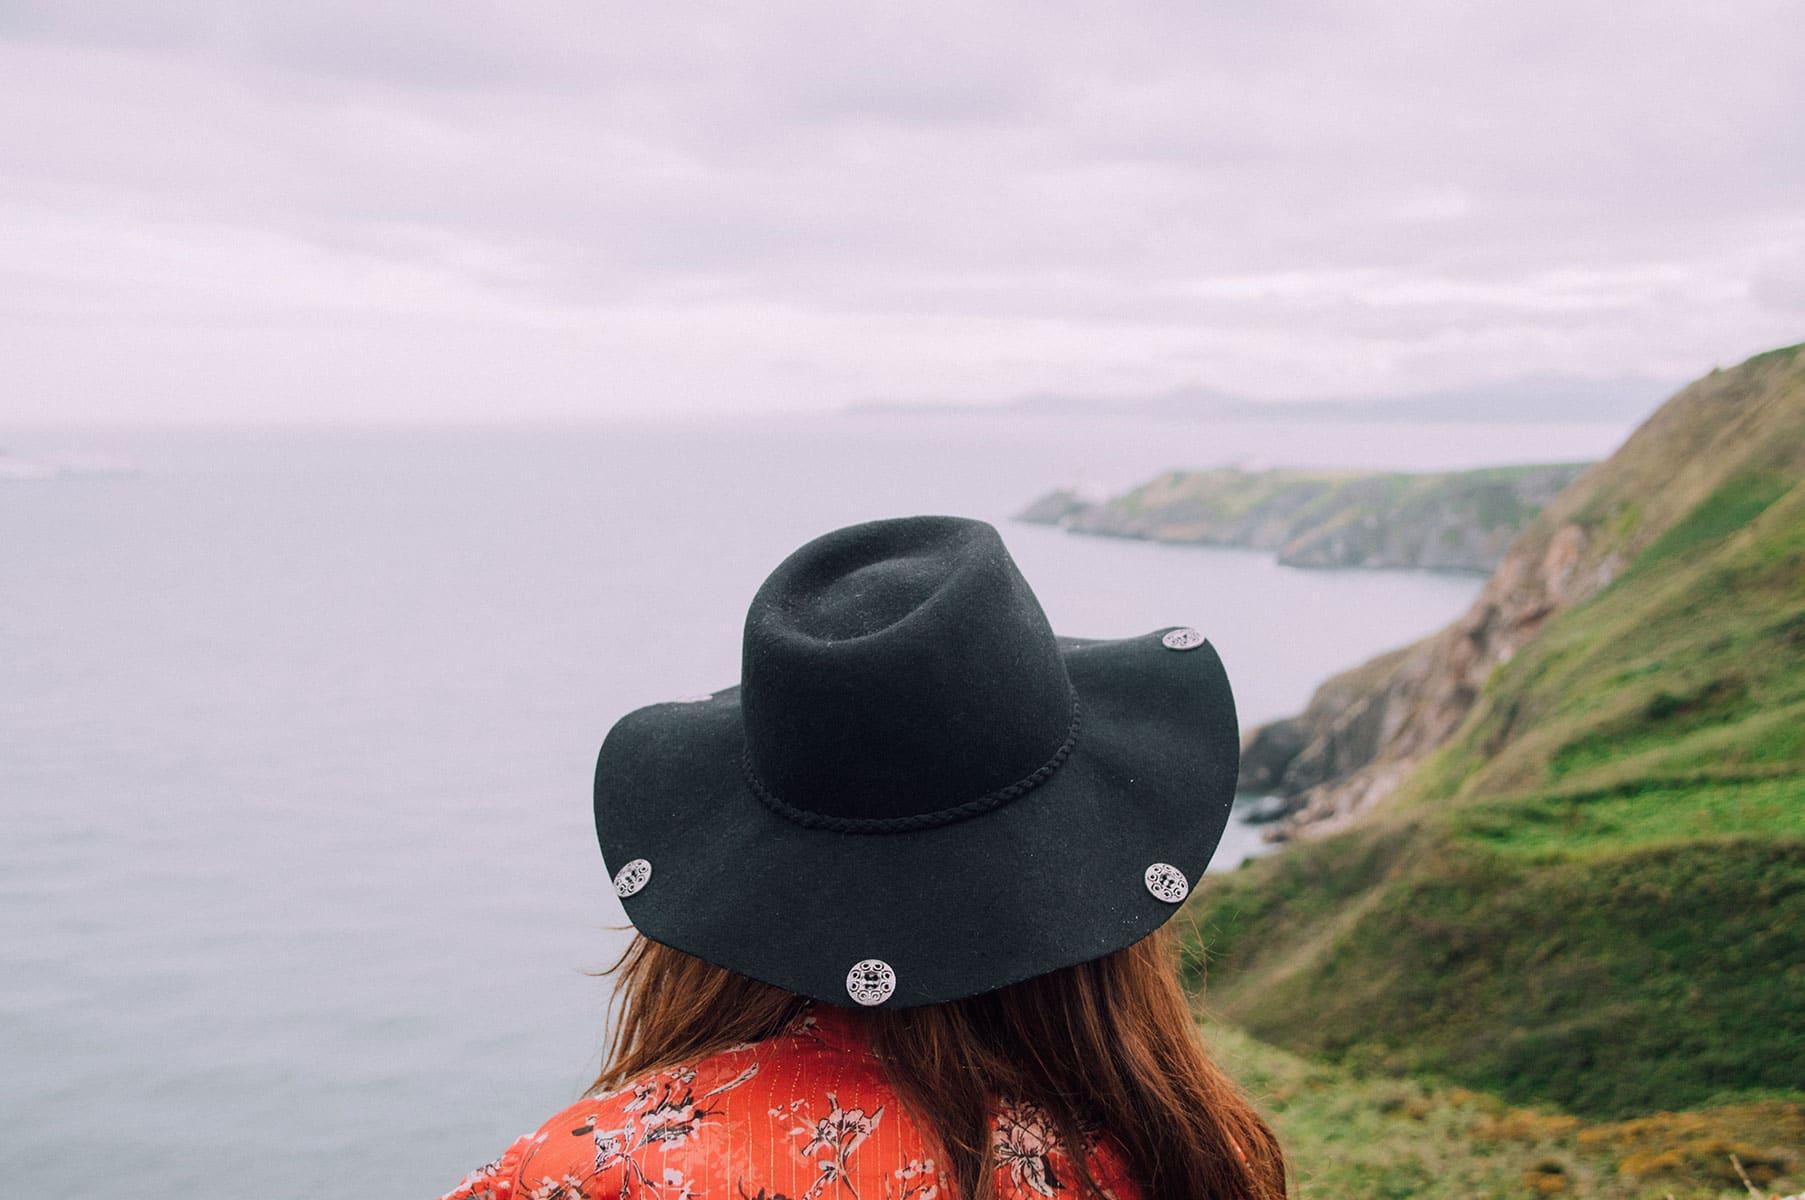 dublin_howth_cliff_walk_girl_001